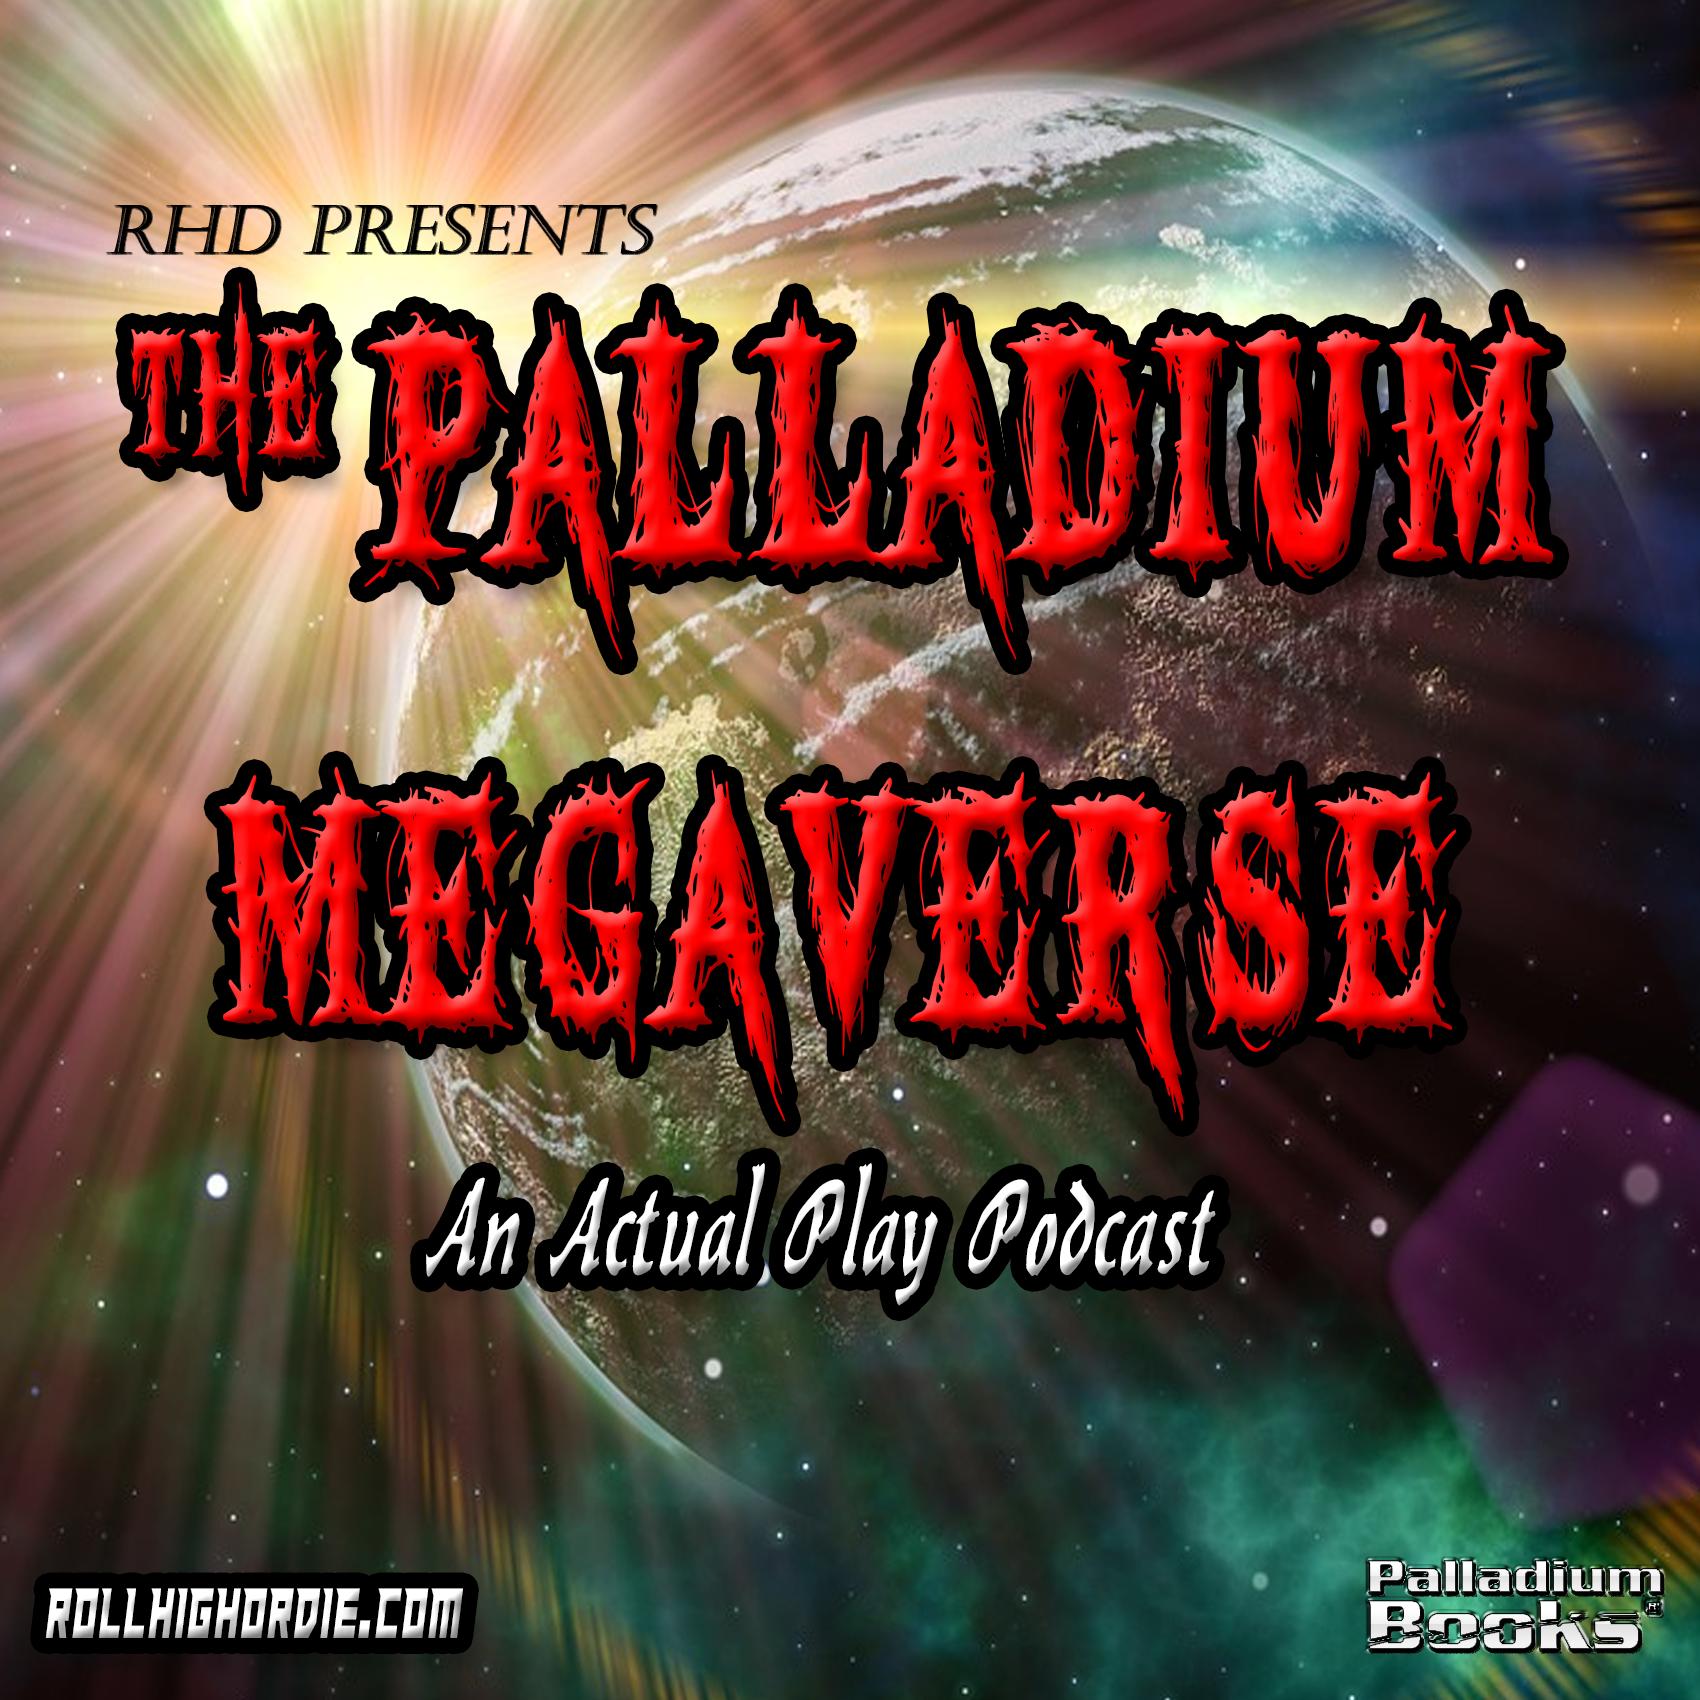 The Palladium MegaVerse Podcast